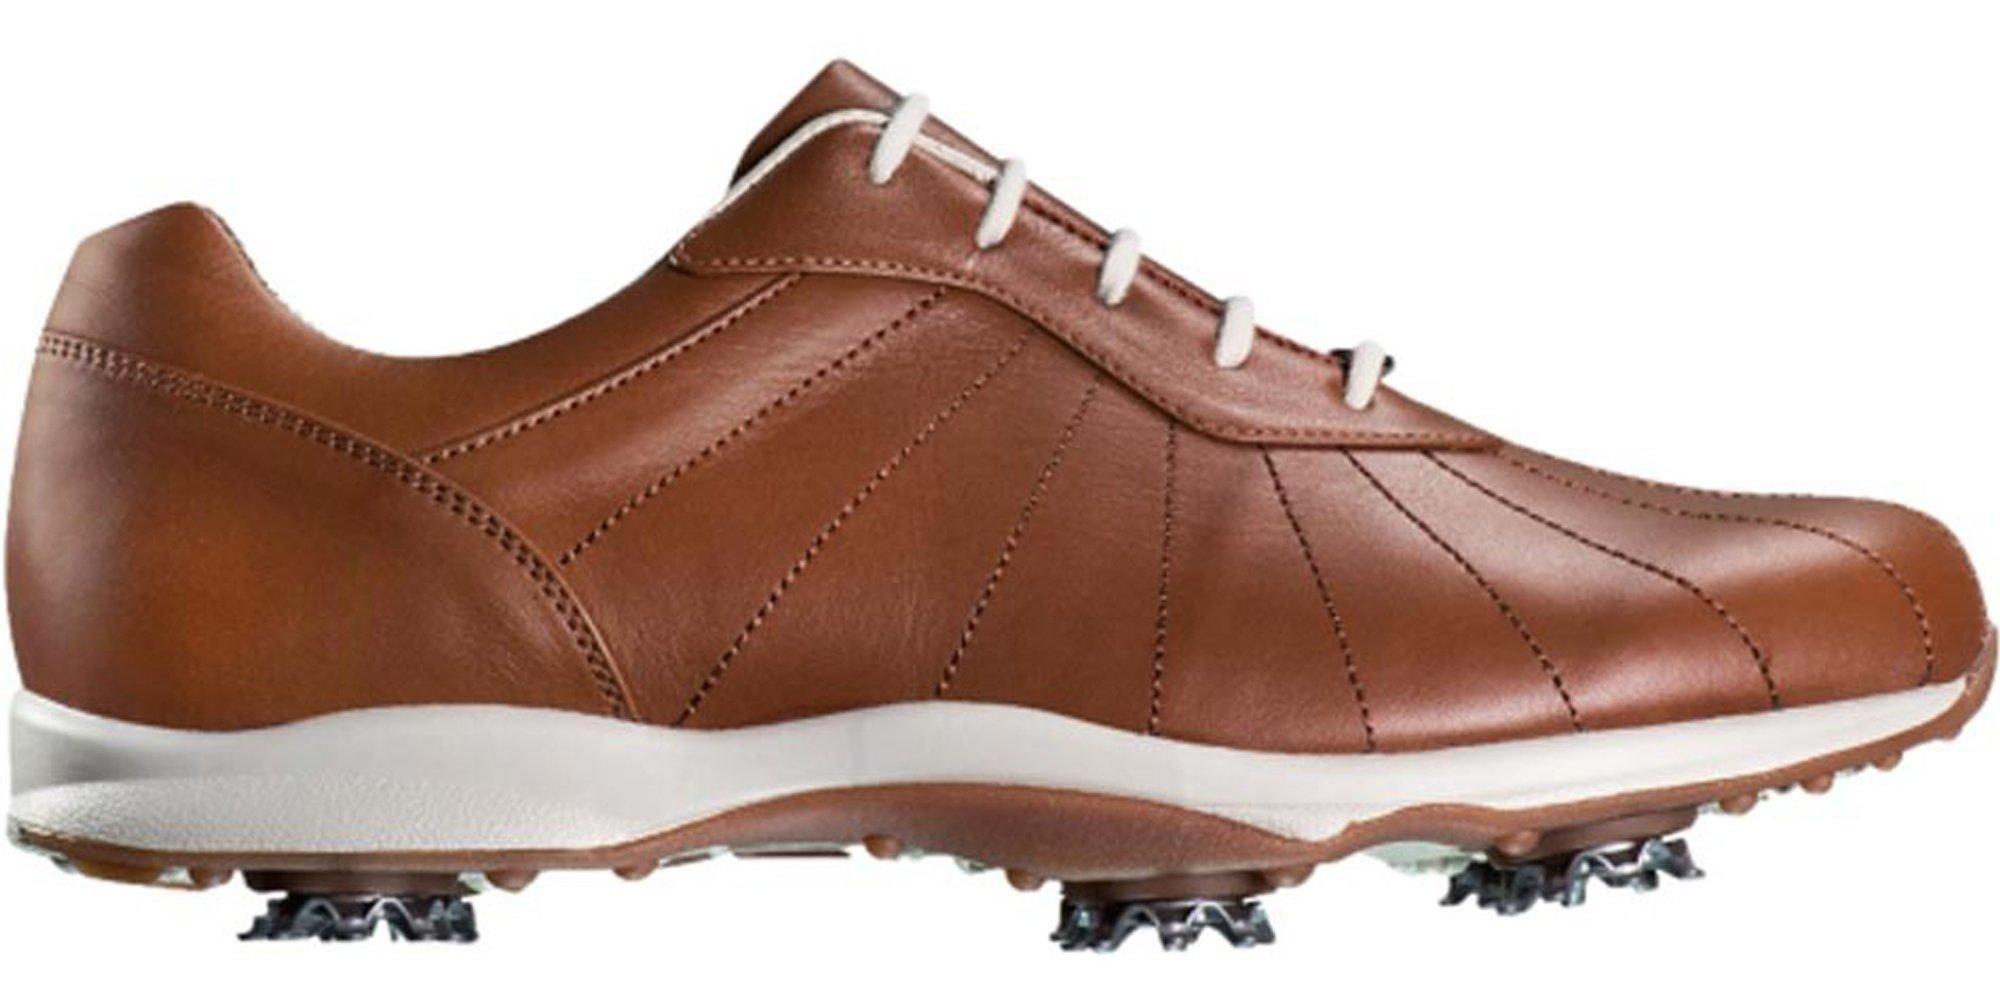 FootJoy Ladies emBODY Golf Shoes Caramelo 7 Medium Closeout